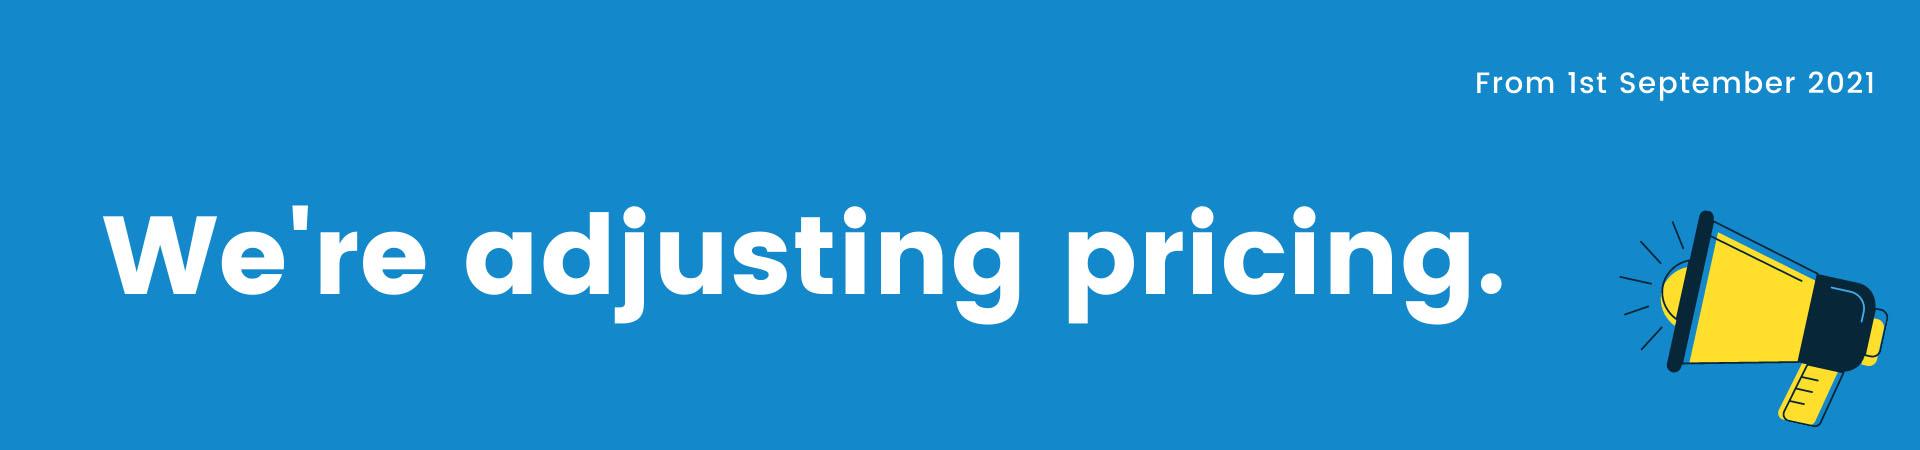 We're adjusting pricing from 1st September 2021